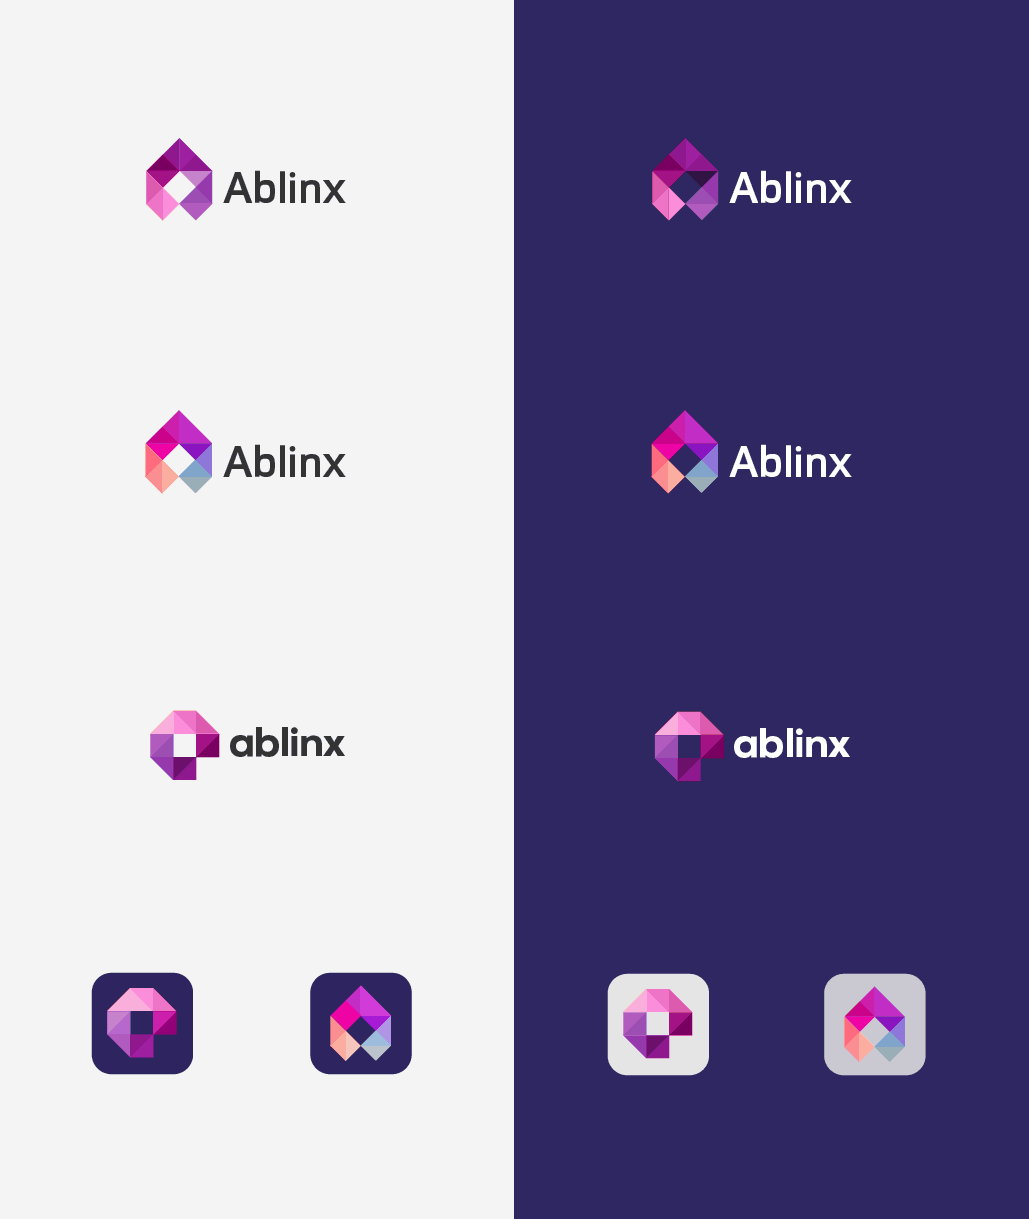 Ablinx Logo Design and iOS App Icon - Designed by The Logo Smith